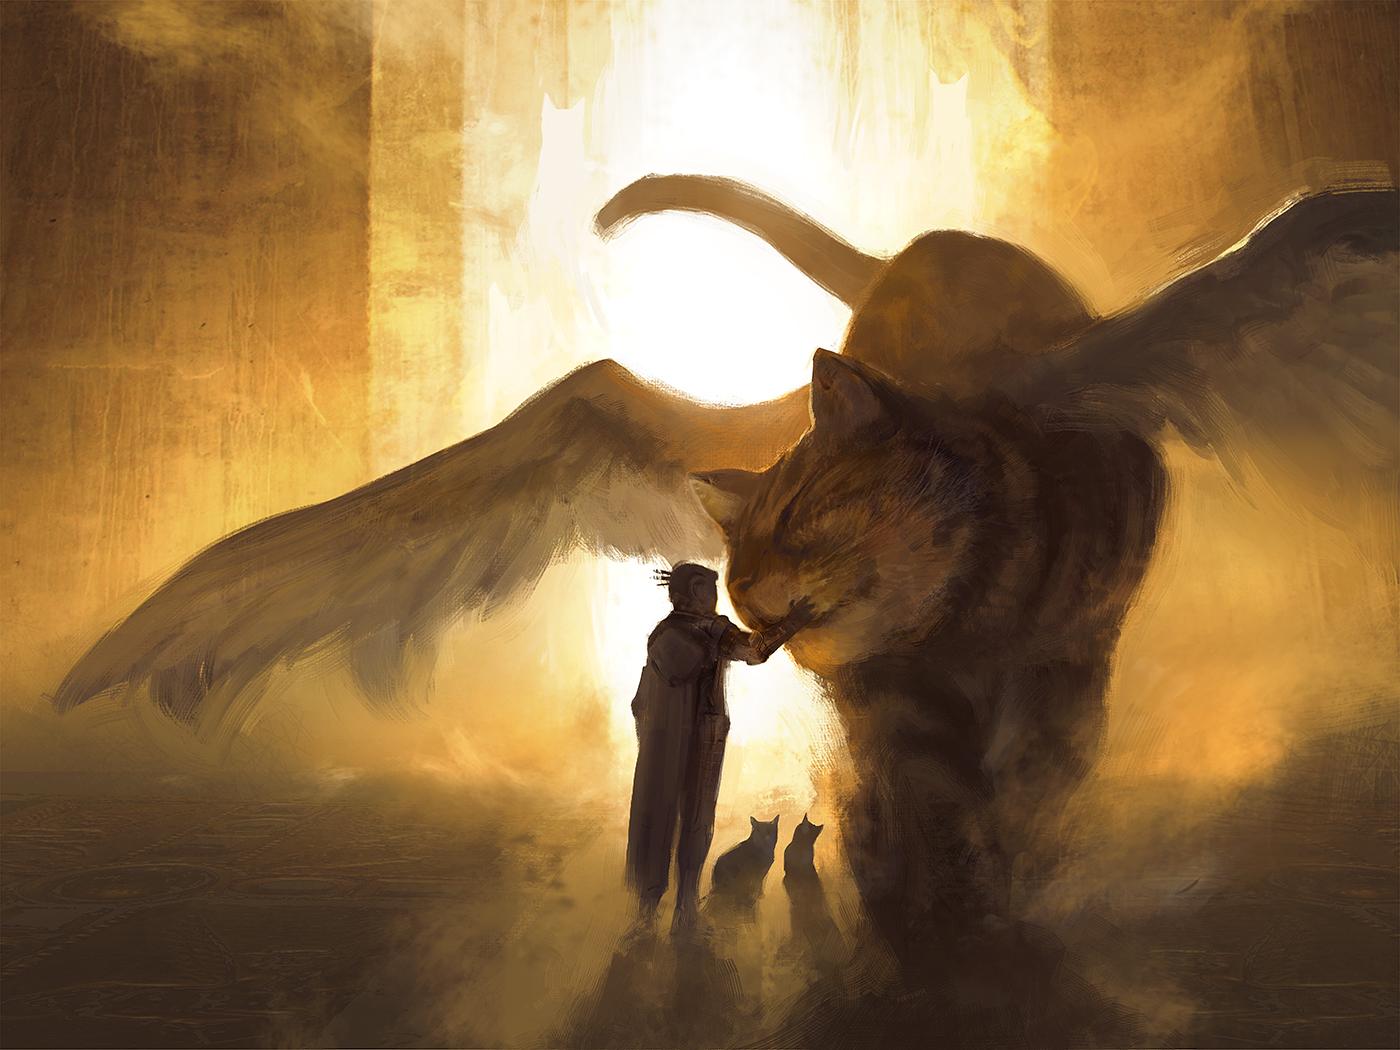 Farewell by Skyrion